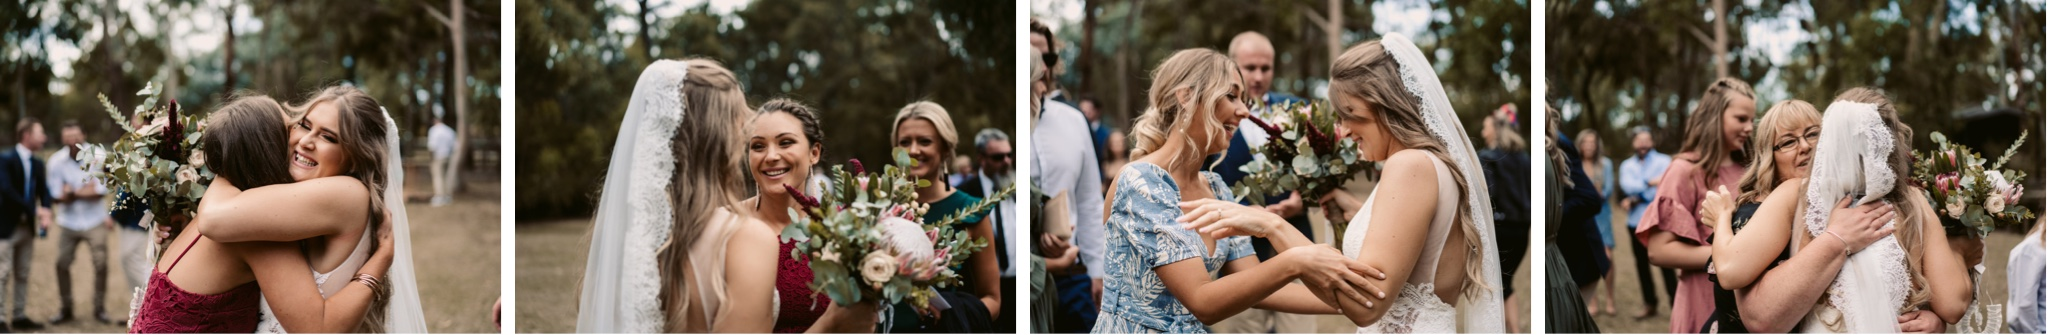 Mornington Peninsula Wedding Photography60.jpg